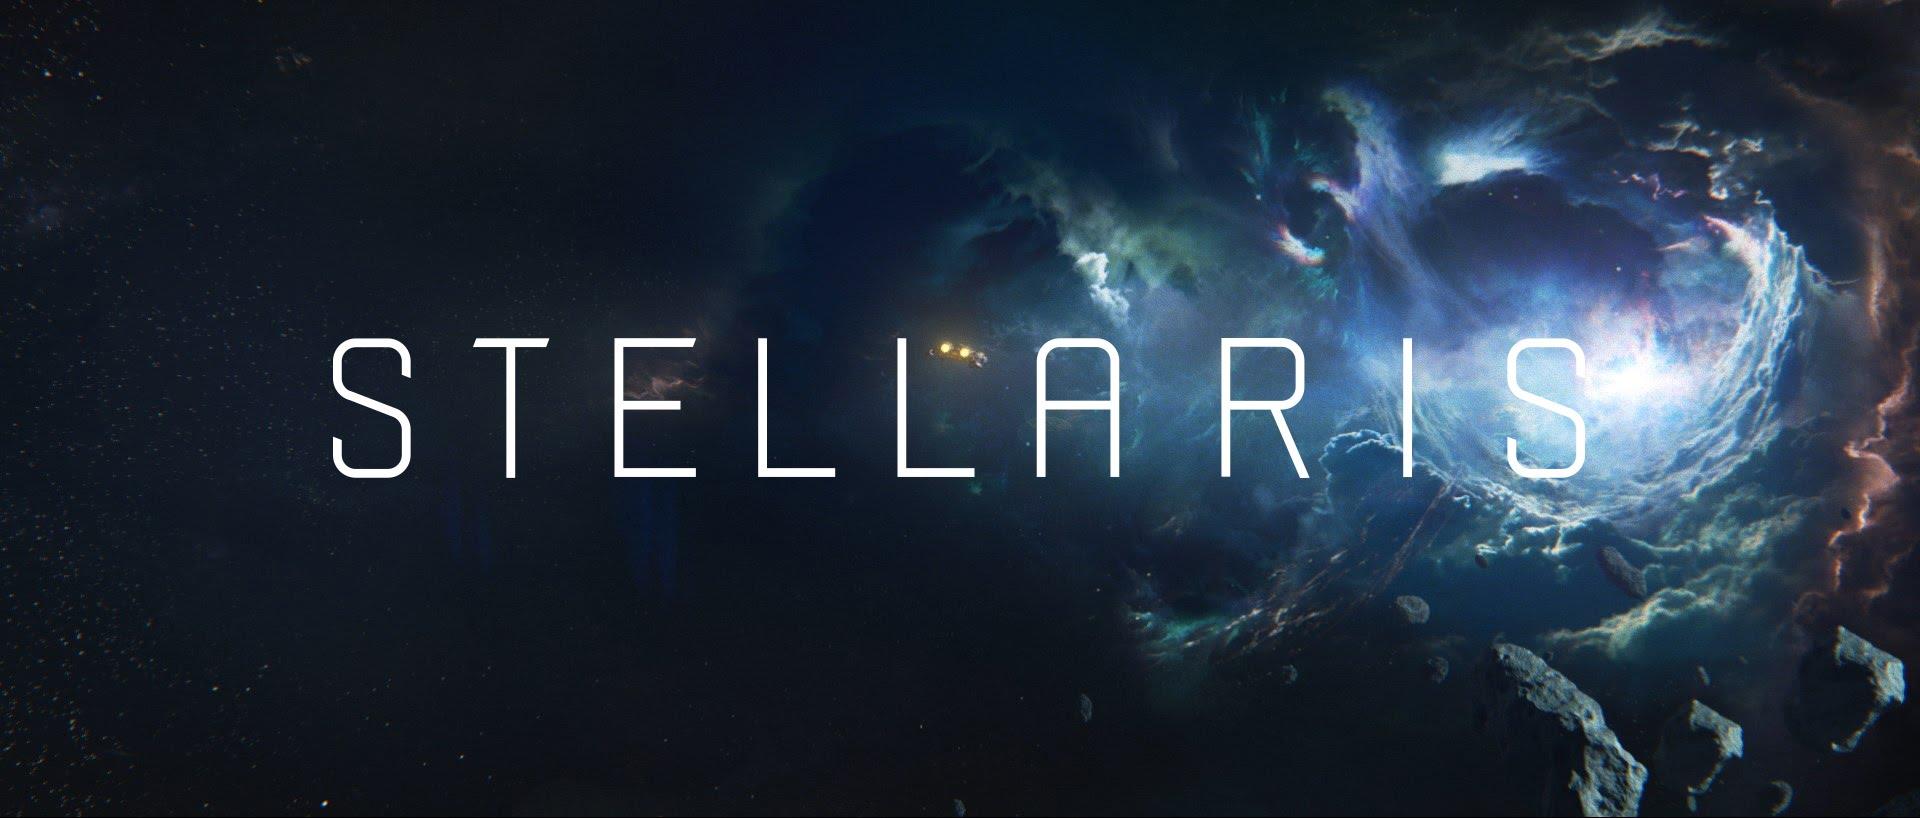 Stellar Design Studio